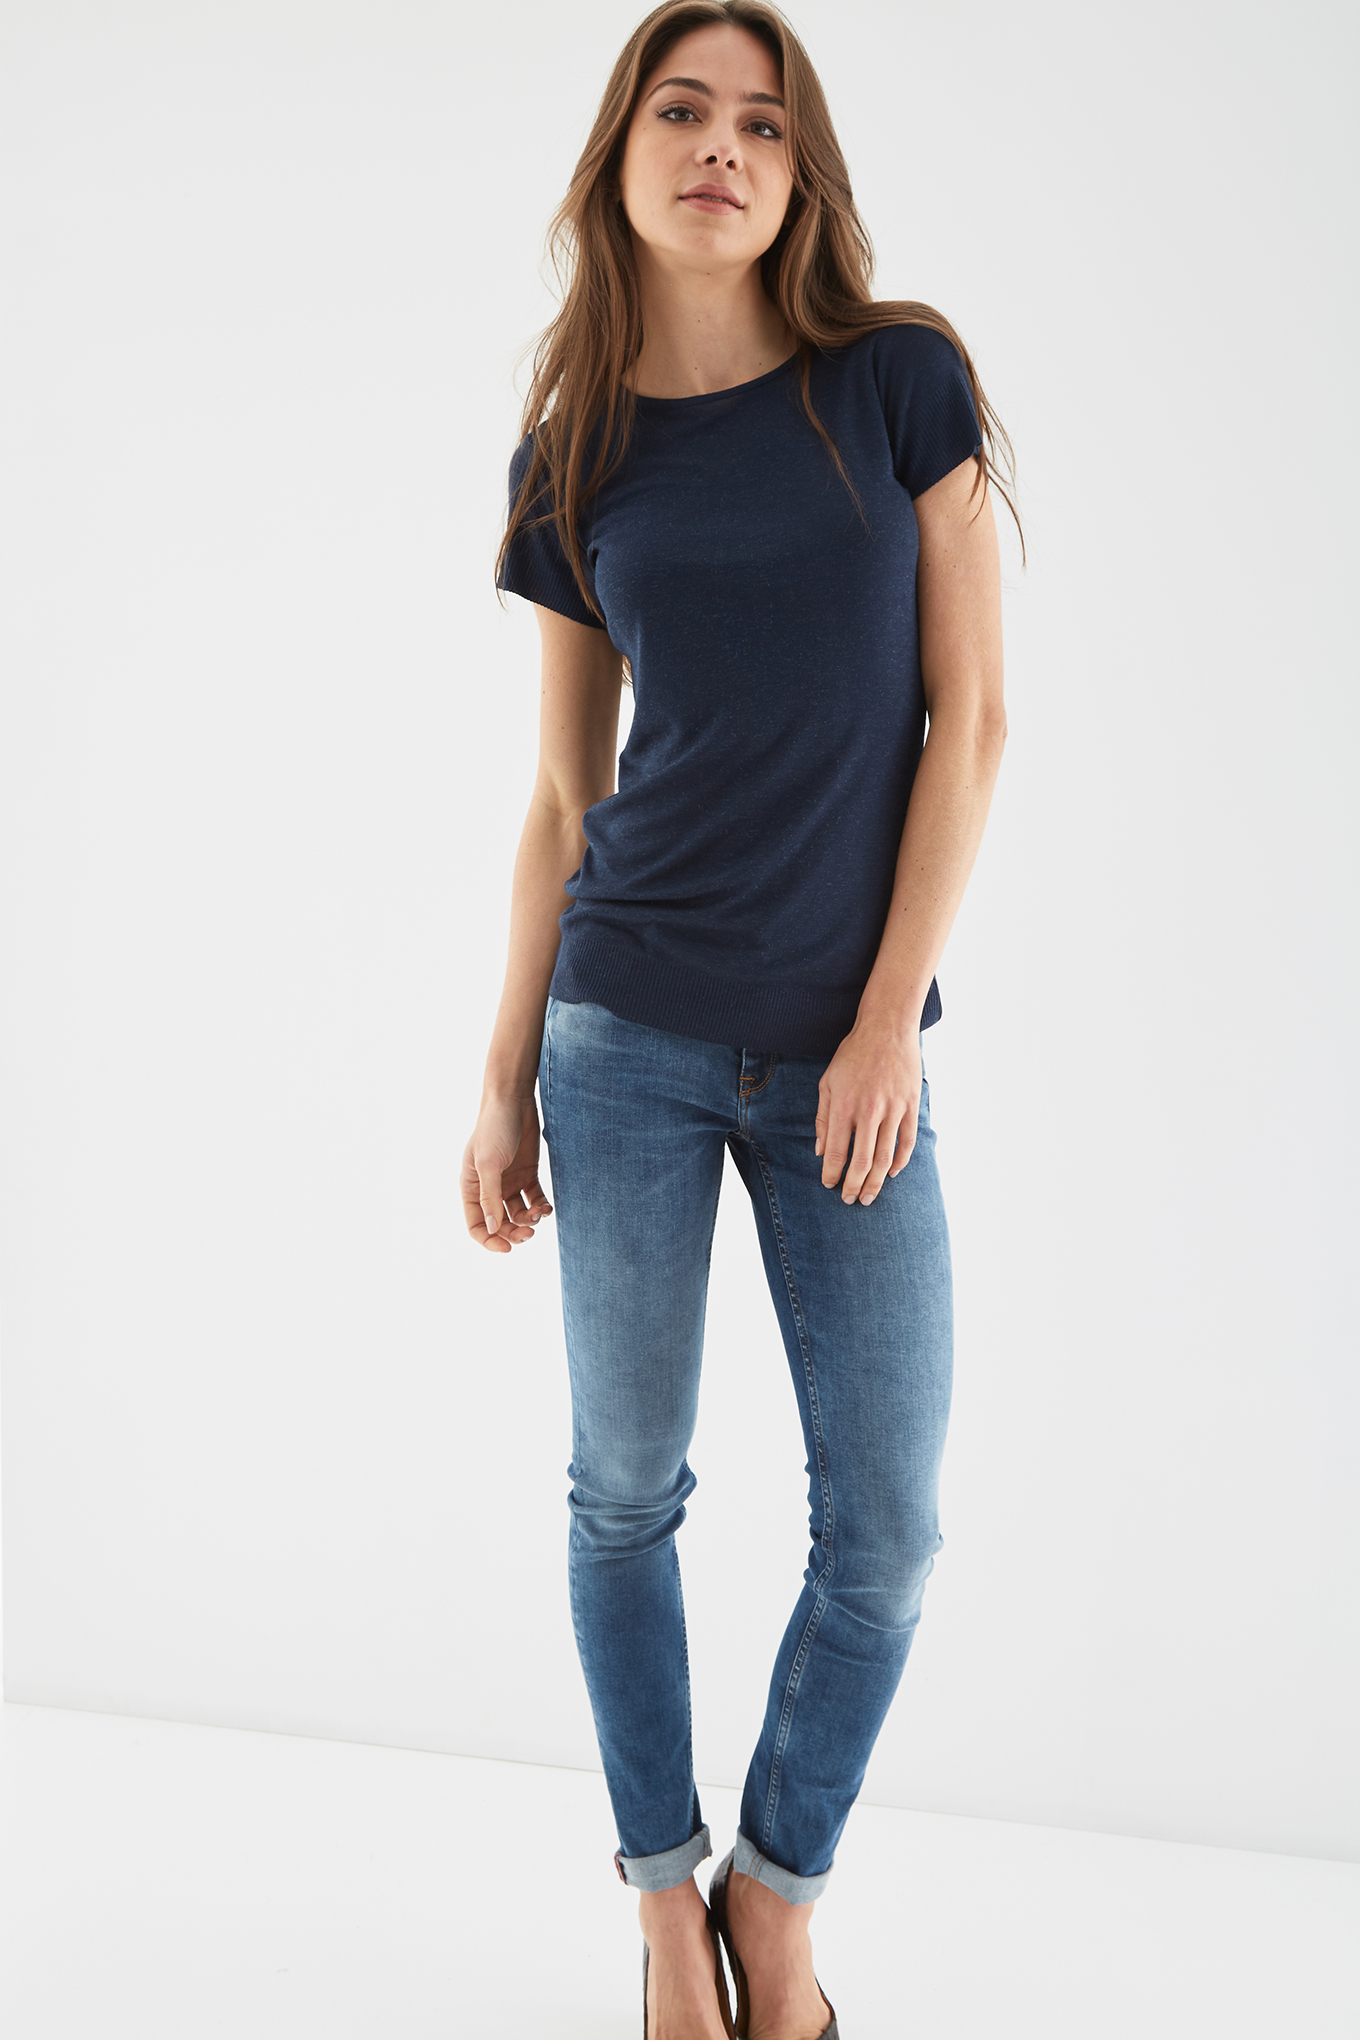 T-Shirt Dark Blue Casual Woman